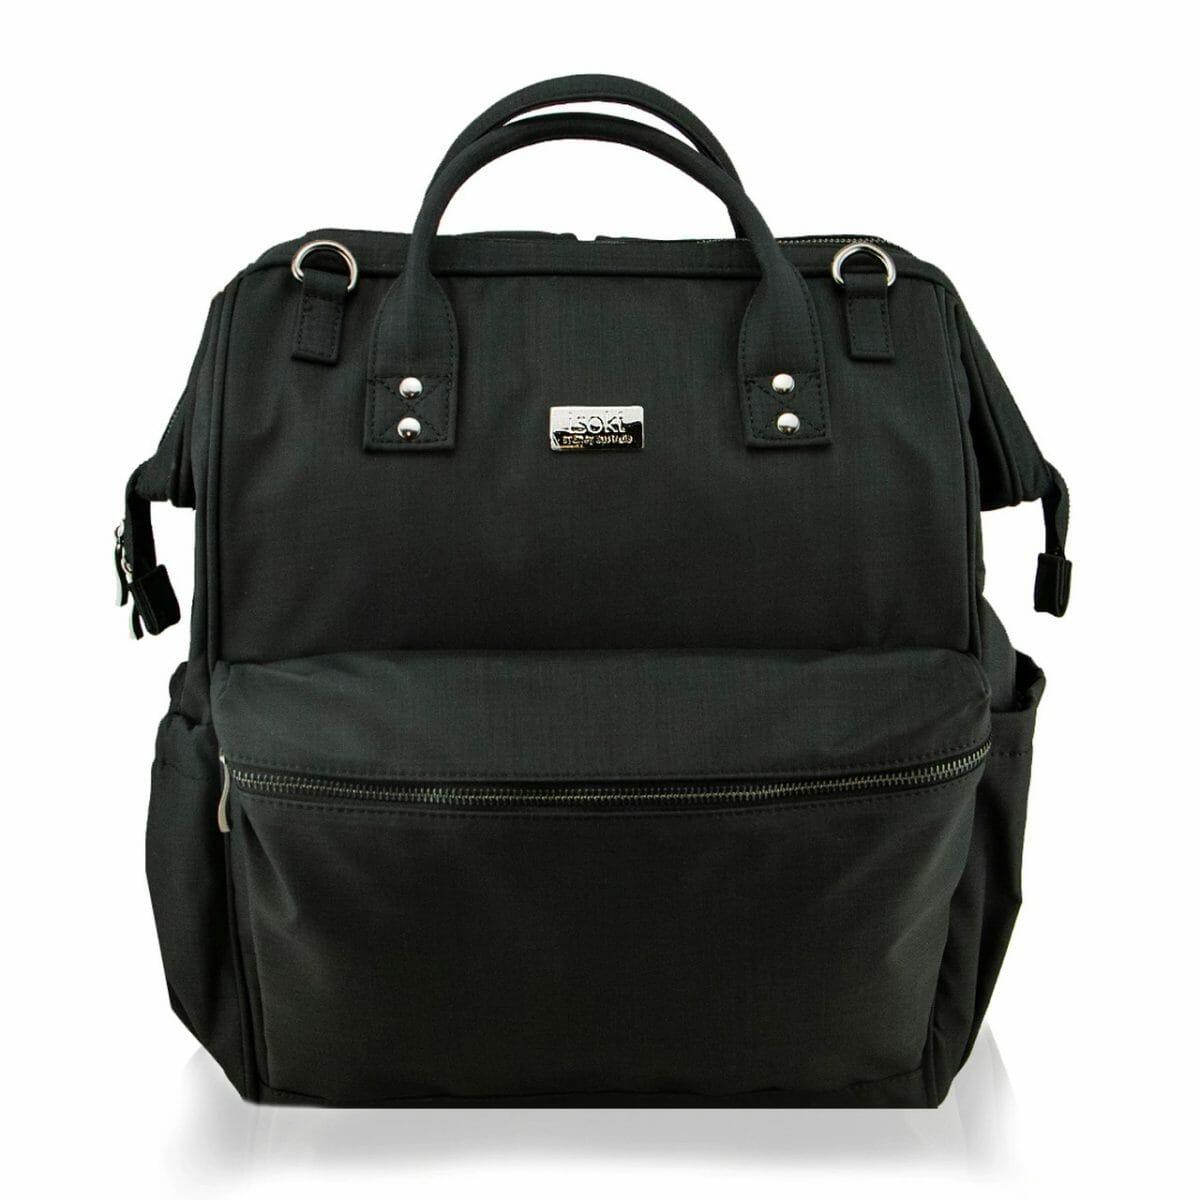 Isoki Byron Backpack Black Nylon Front